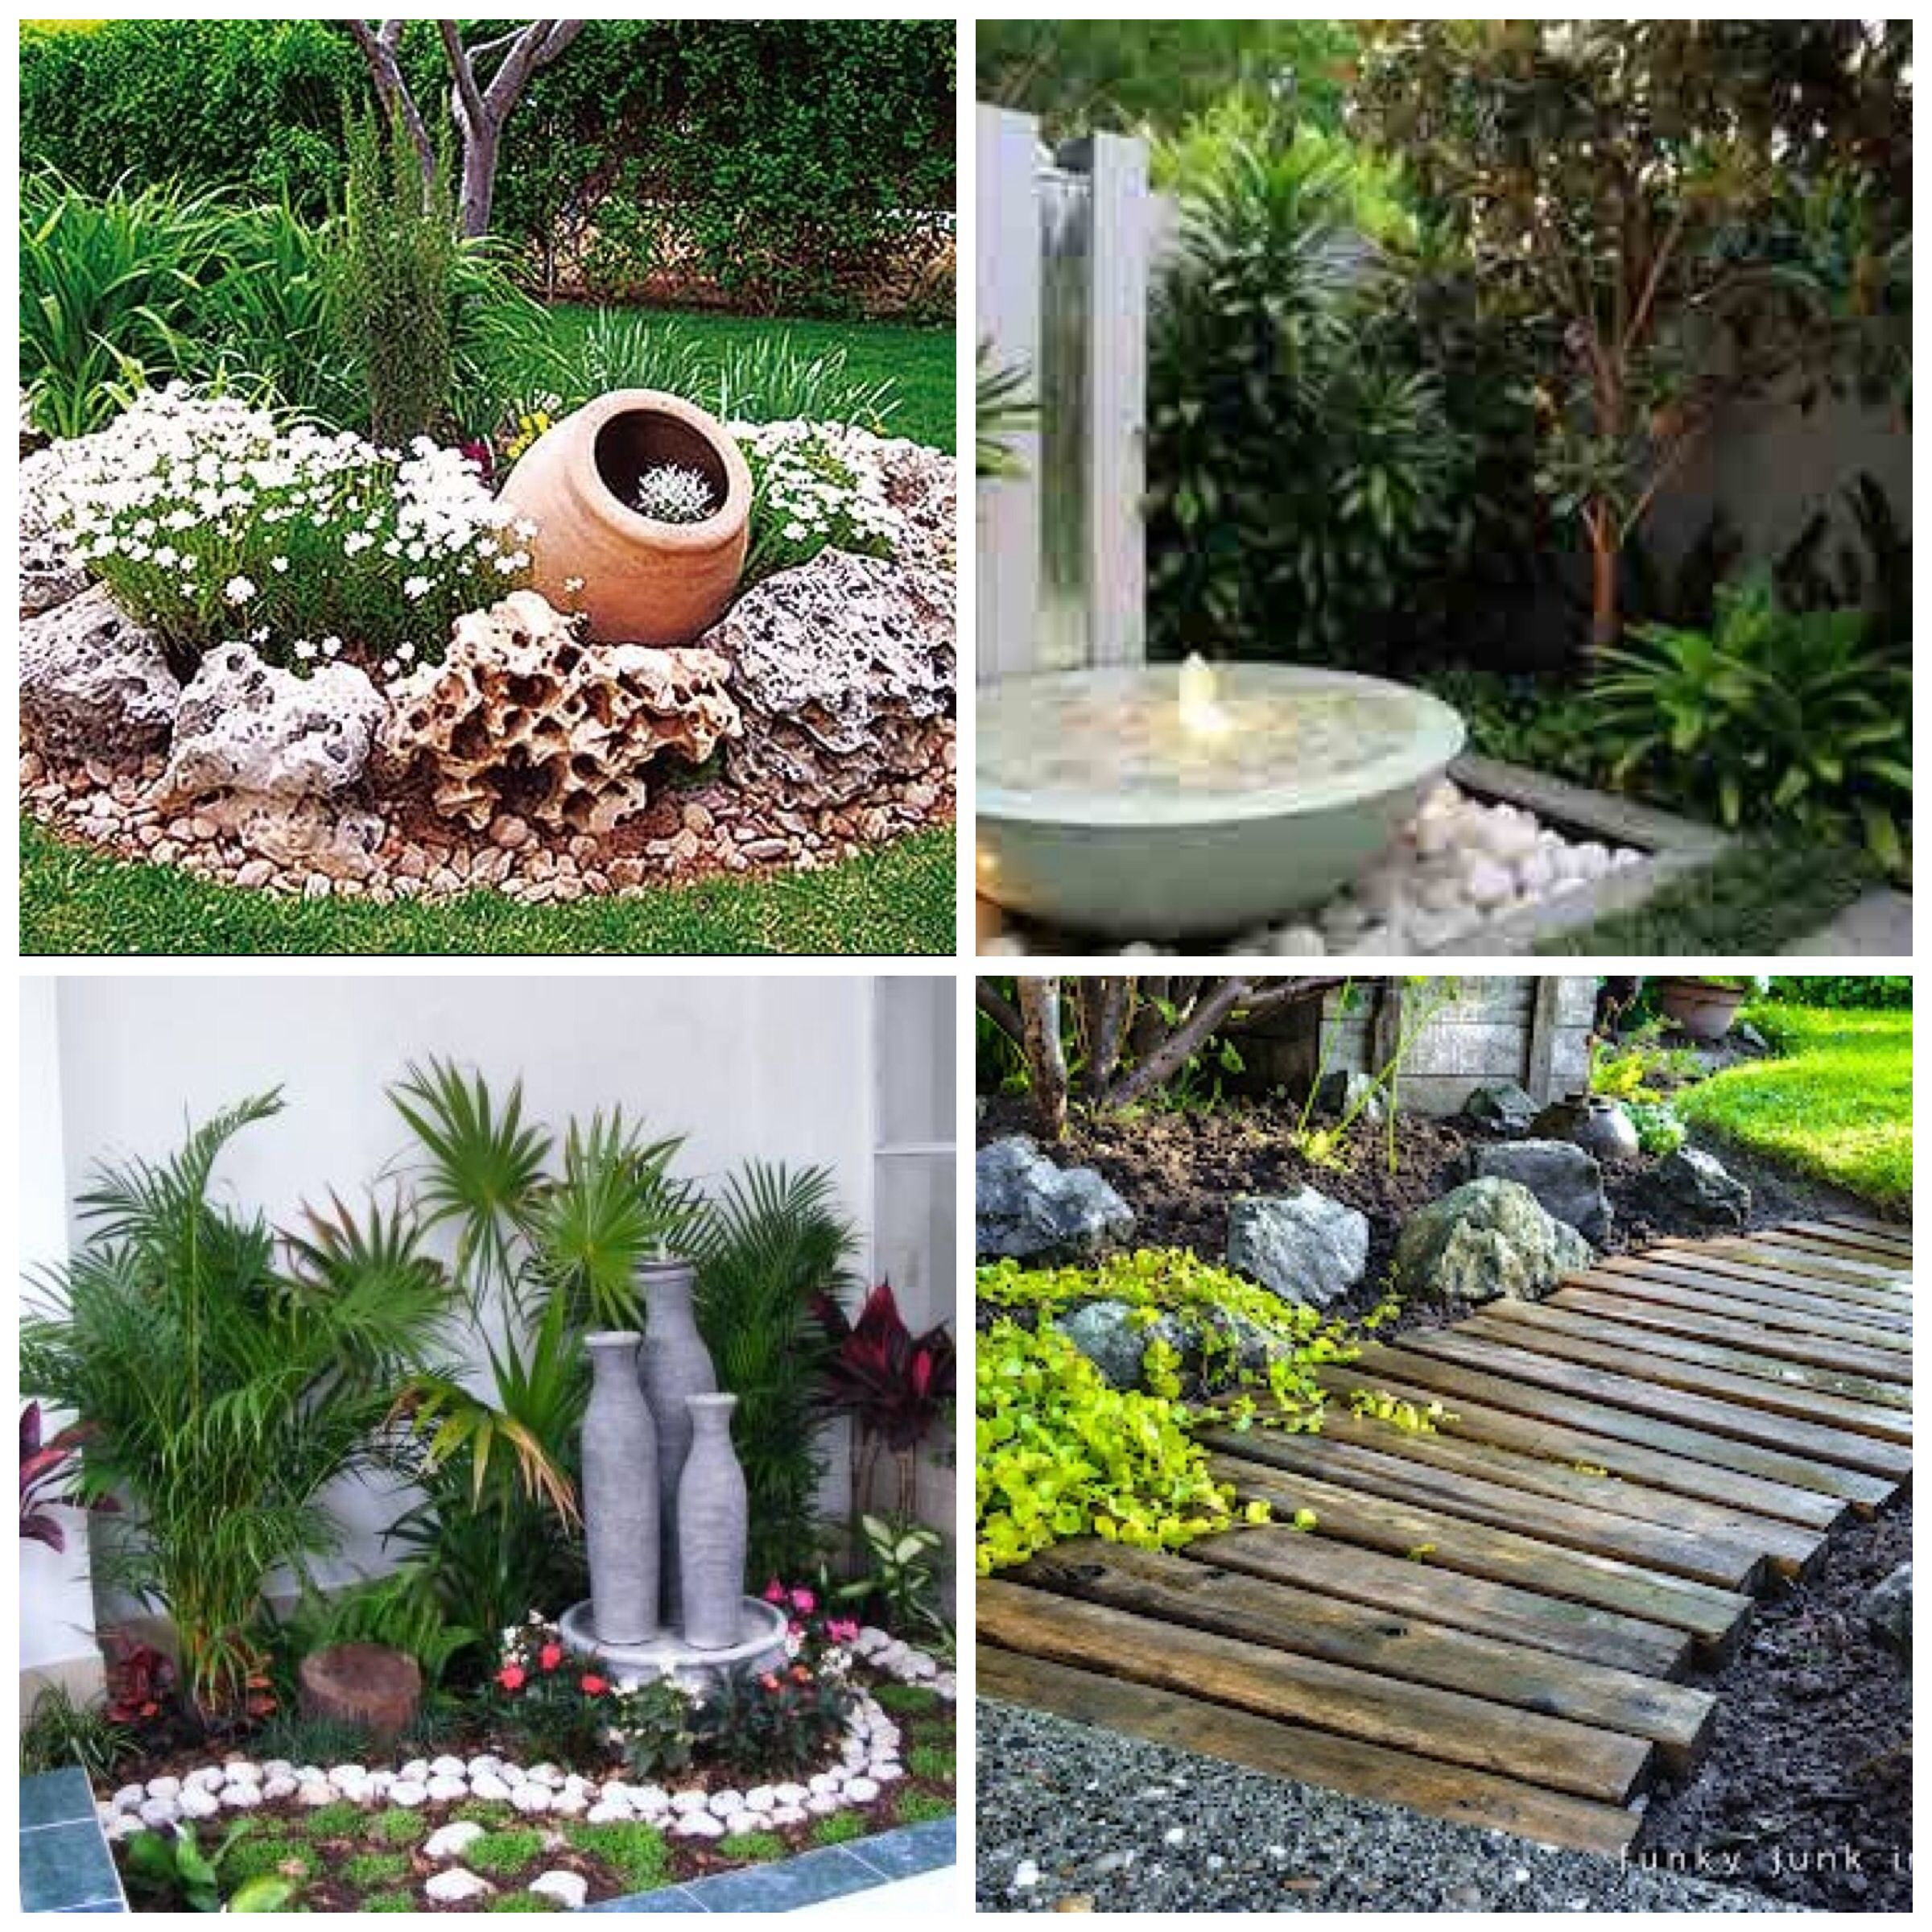 Diseño de jardines | jardin | Pinterest | Diseños de jardines ...